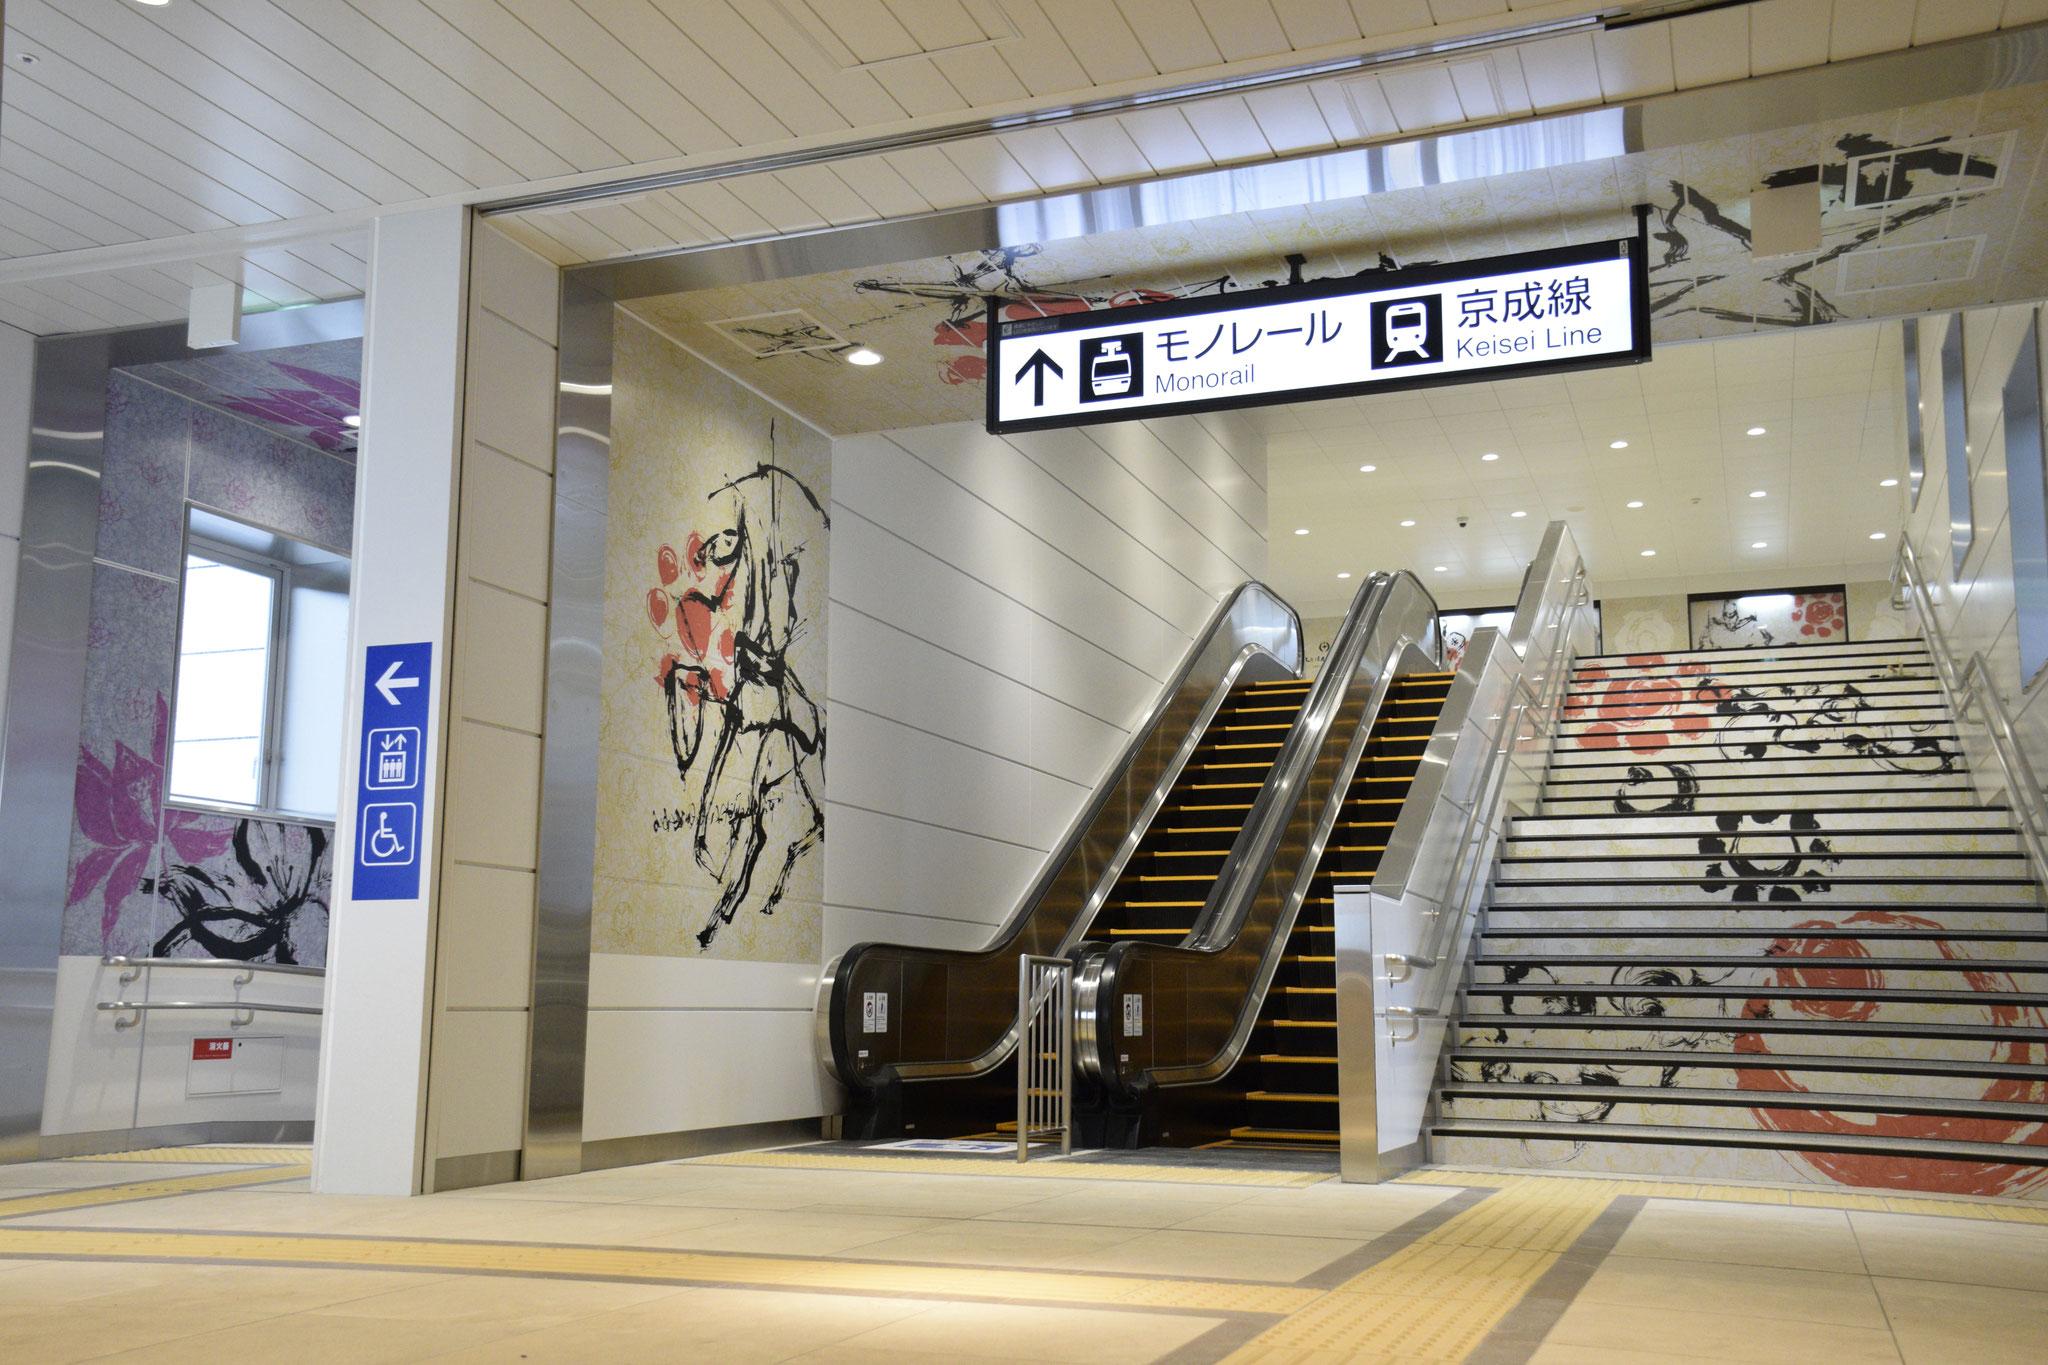 JR千葉駅・モノレール千葉駅連絡通路ラッピングです。千葉市の都市アイデンティティに係る4つの地域資源をテーマに、  アーティストとデザイナーと施工業者が一丸となって作成しました。